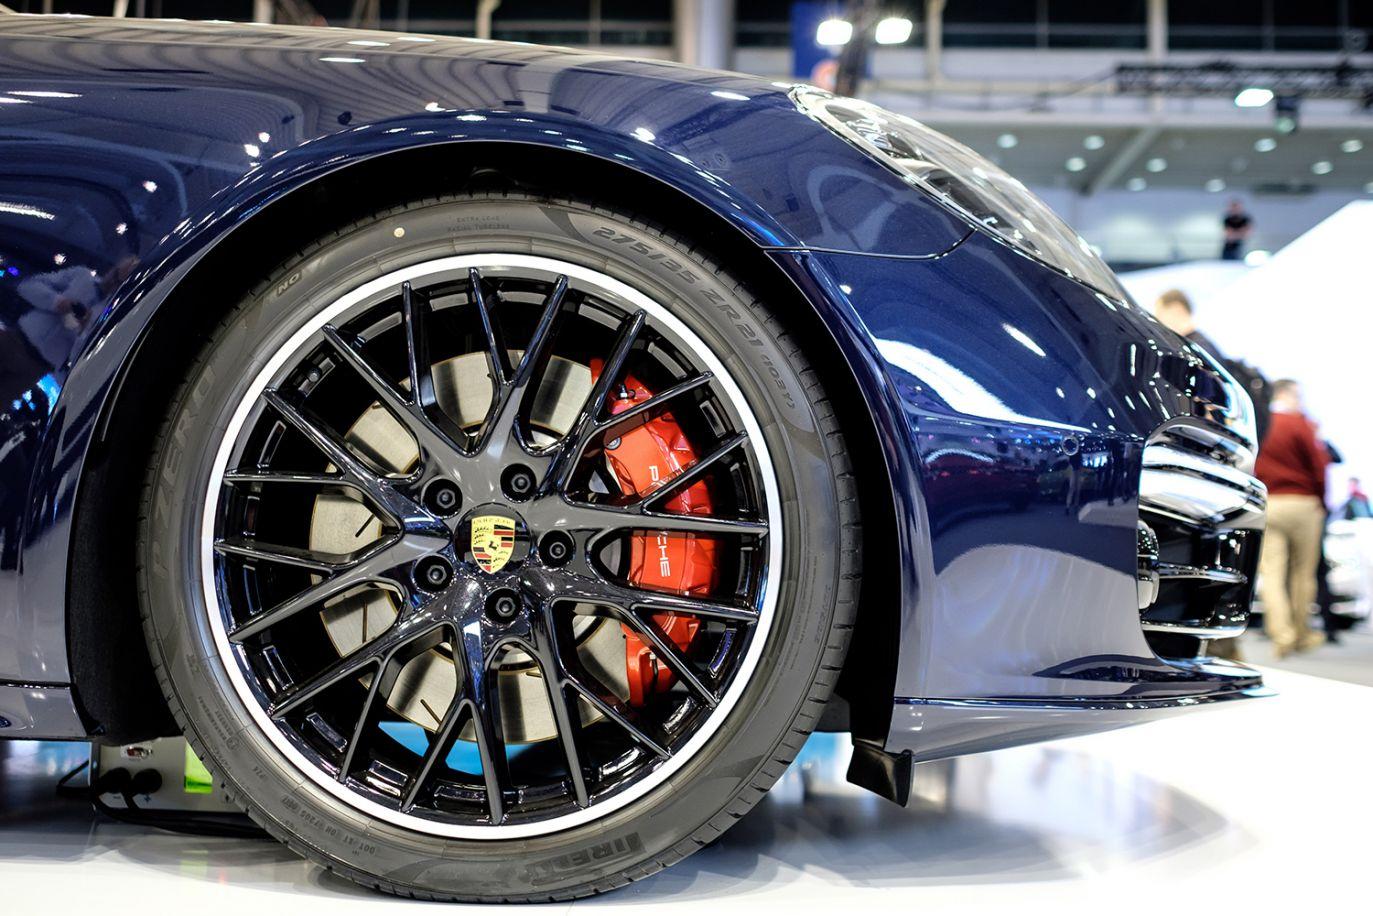 Hamulce Porsche Panamera (fot. arch.PAP/Jakub Kaczmarczyk)